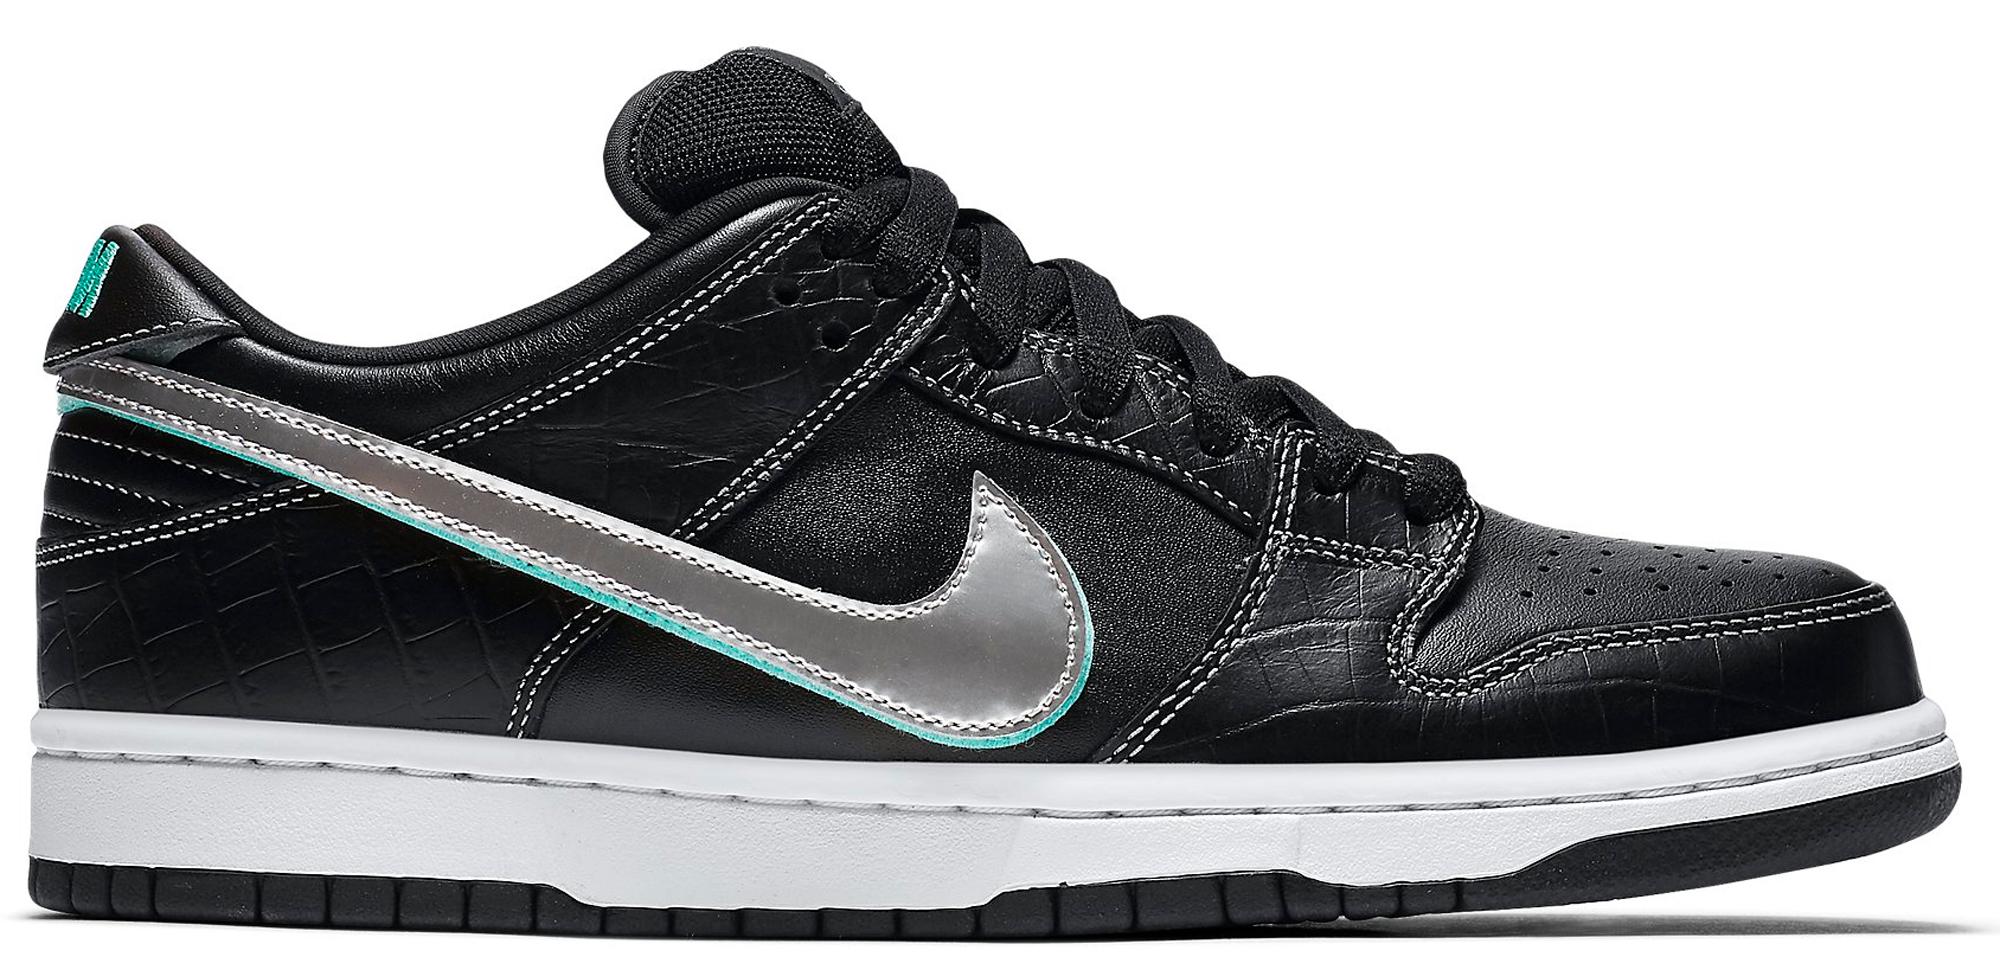 Nike SB Dunk Low Diamond Supply Co Black Diamond